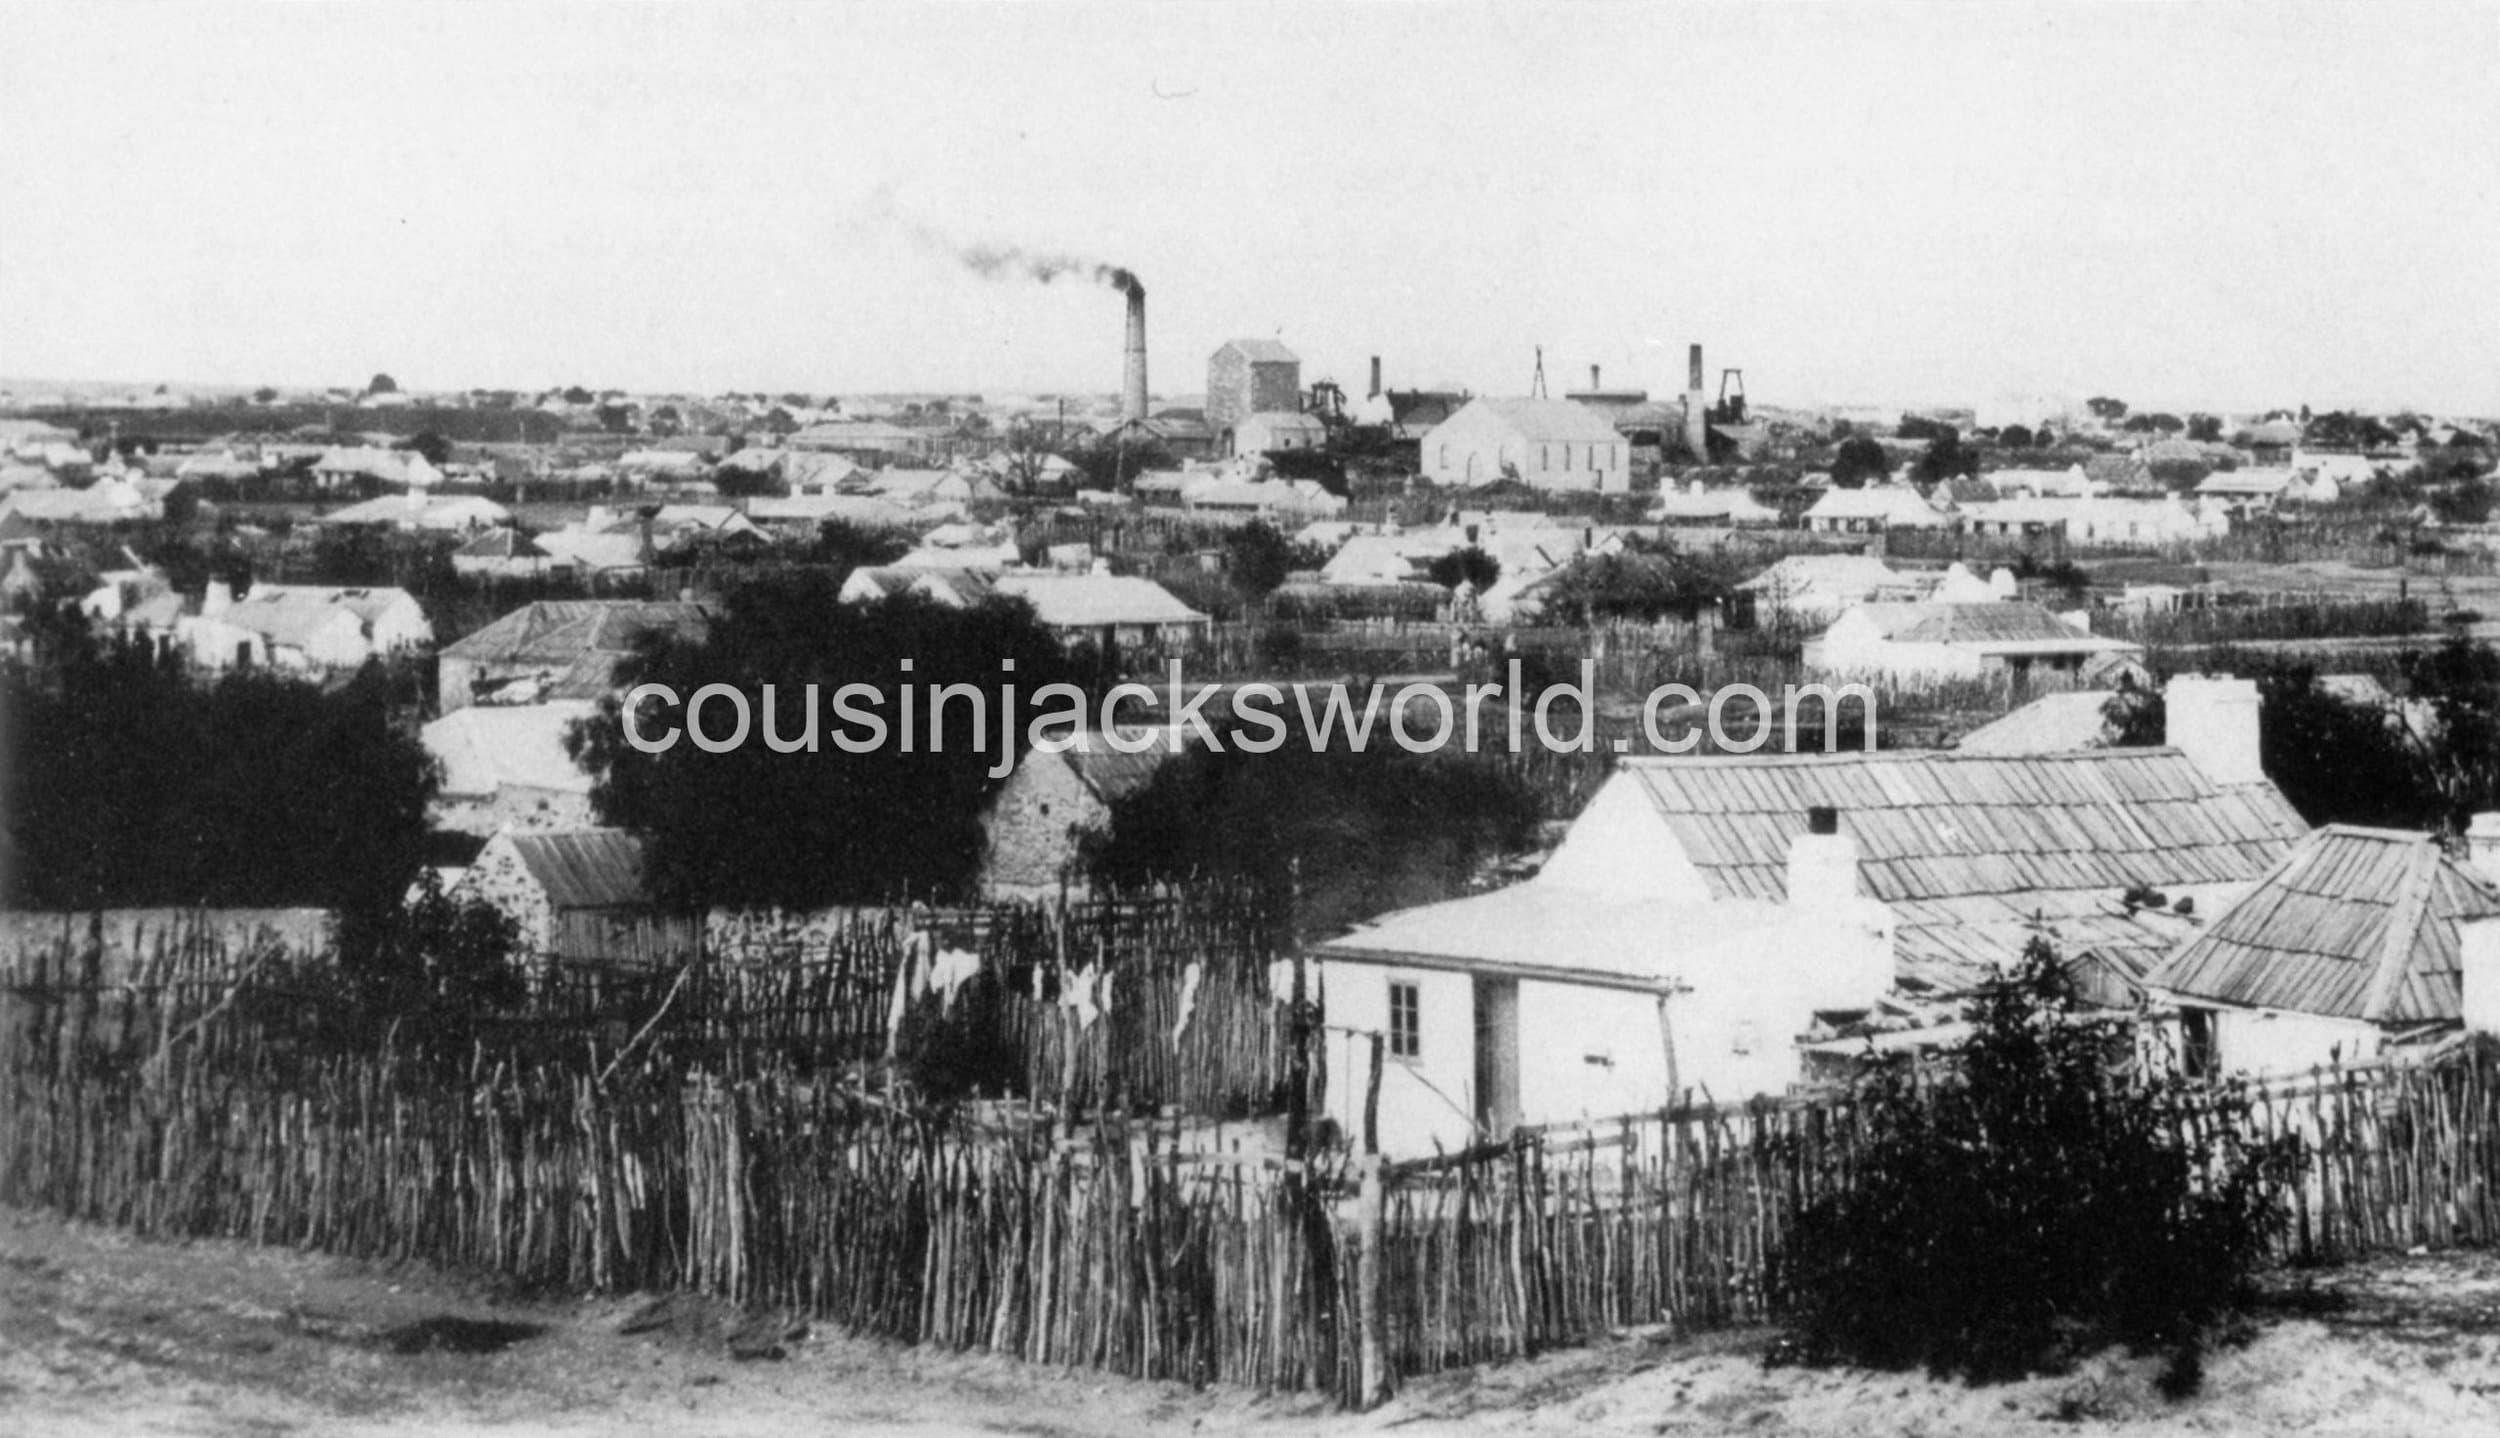 Moonta Mines, South Australia. Cornish mining migration to Australia's Little Cornwall